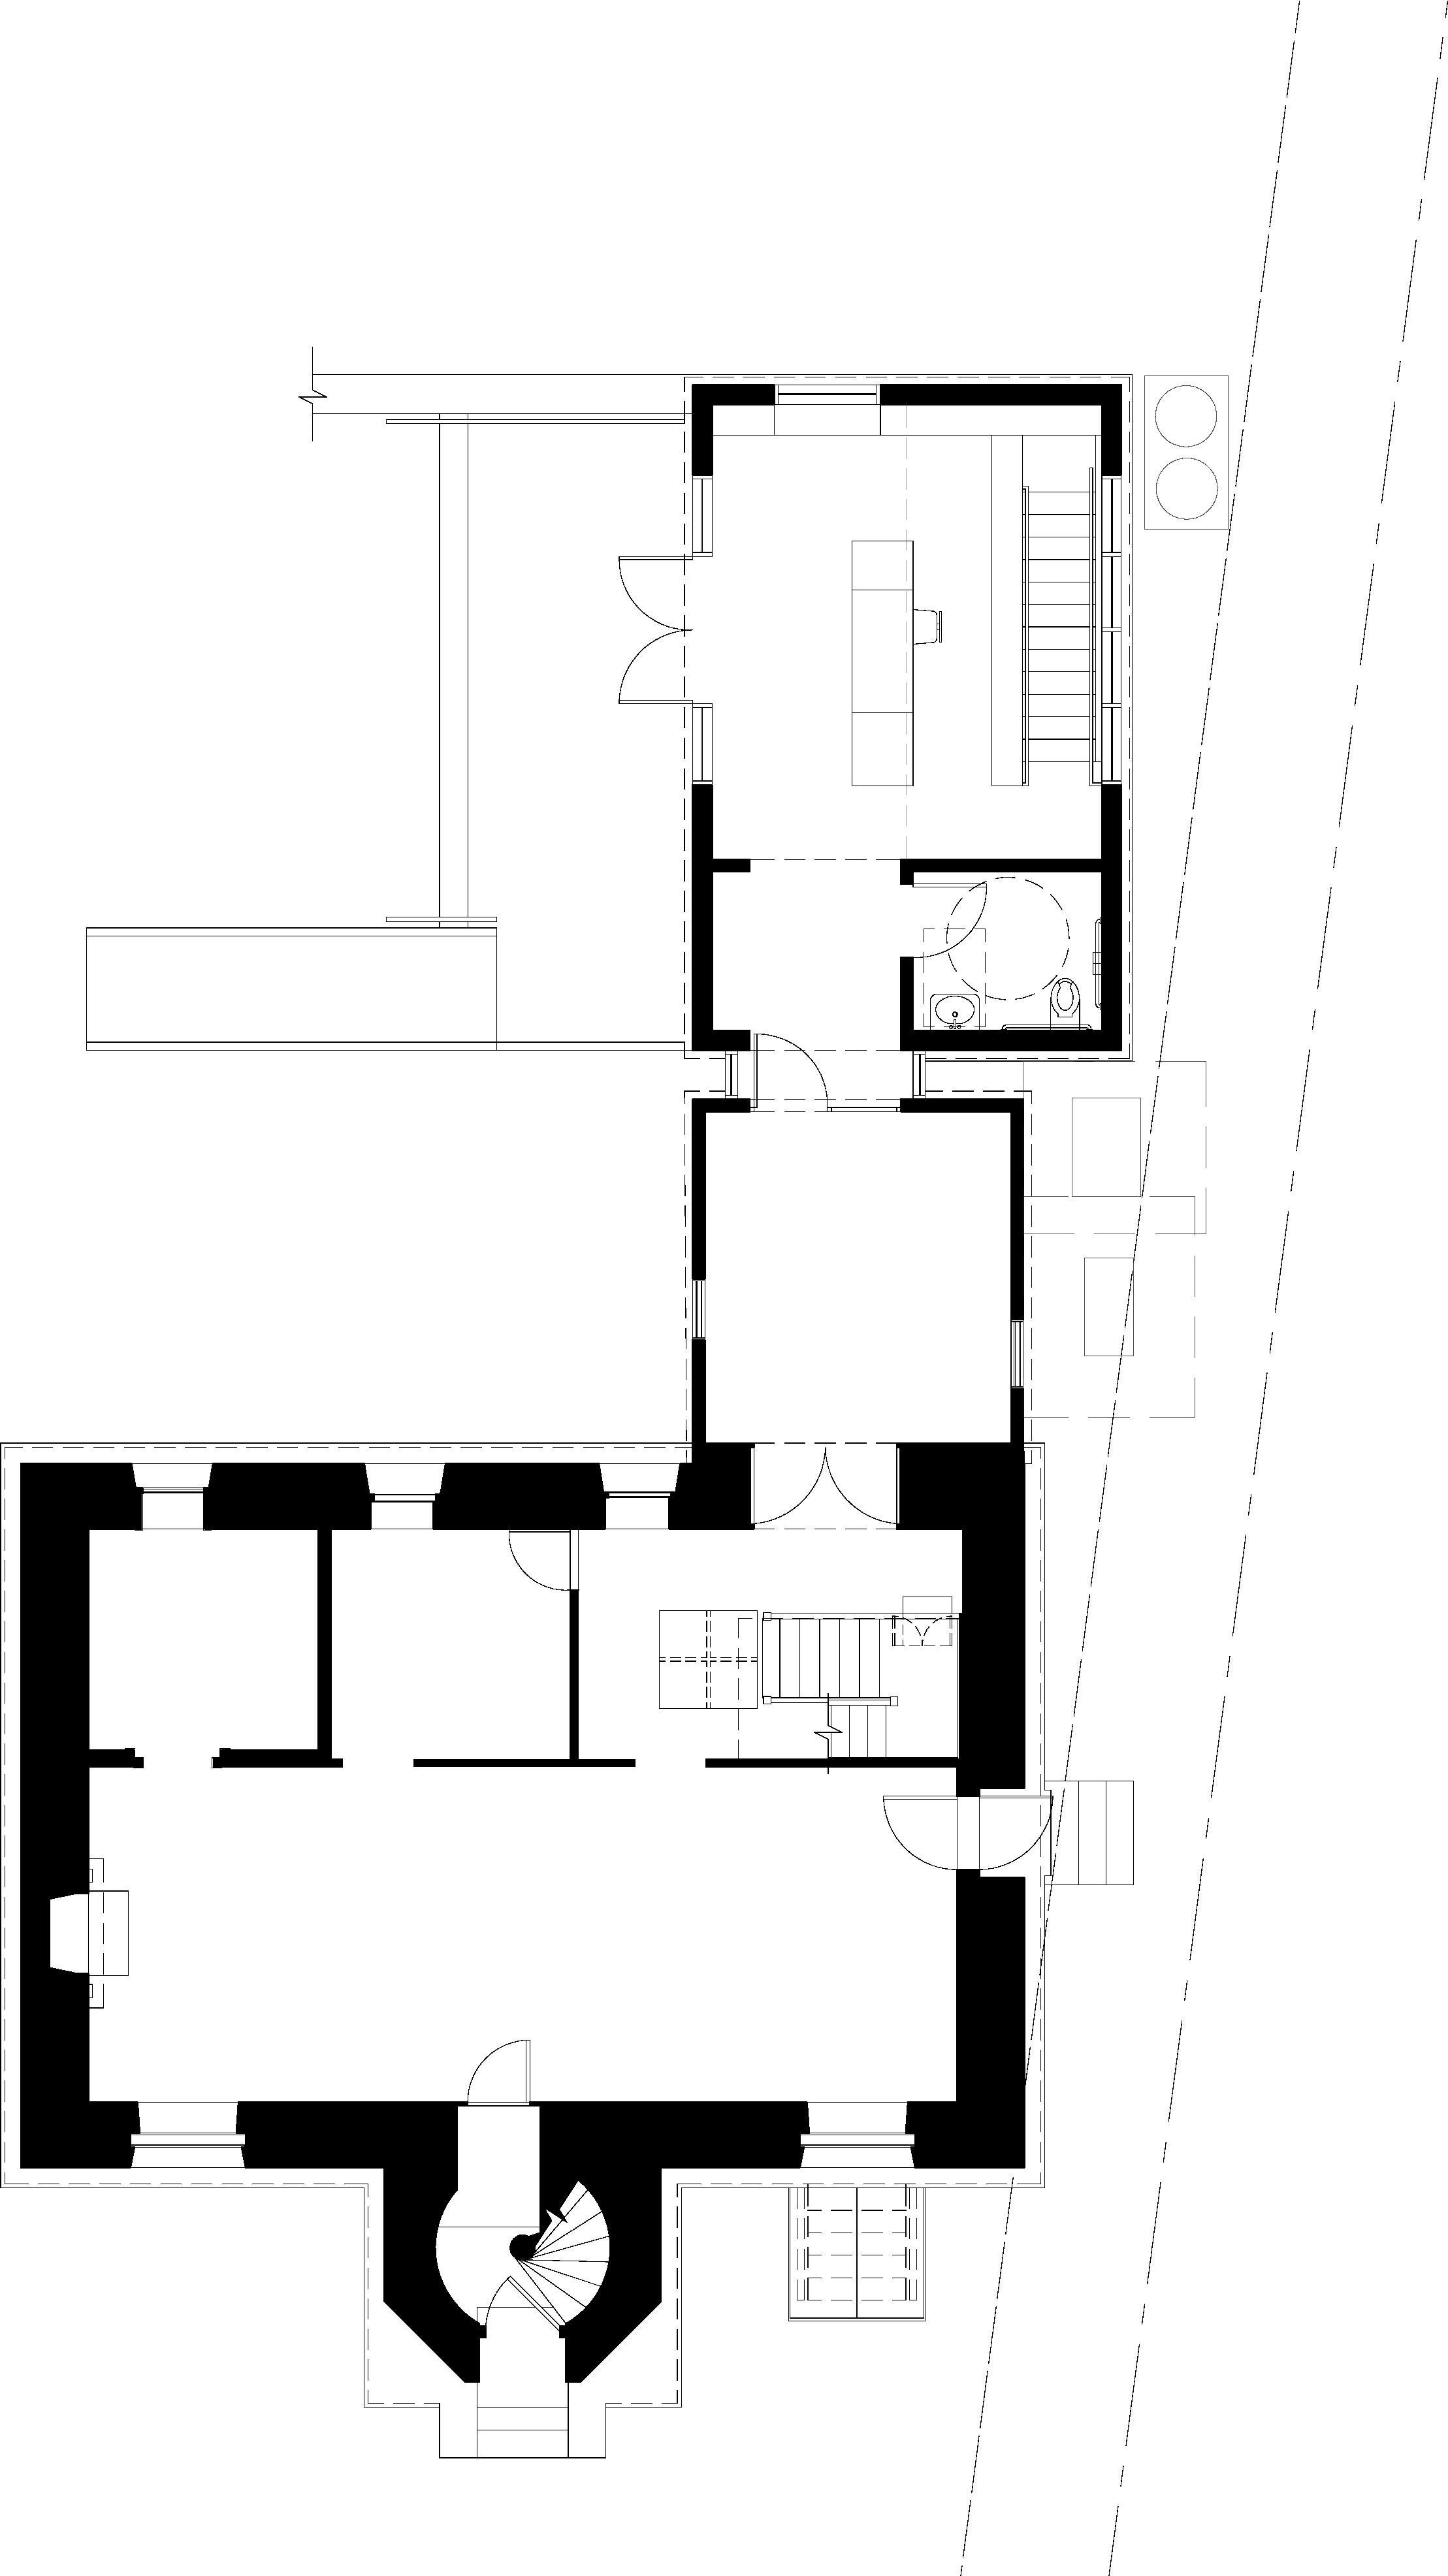 2017 Schematic-1.png